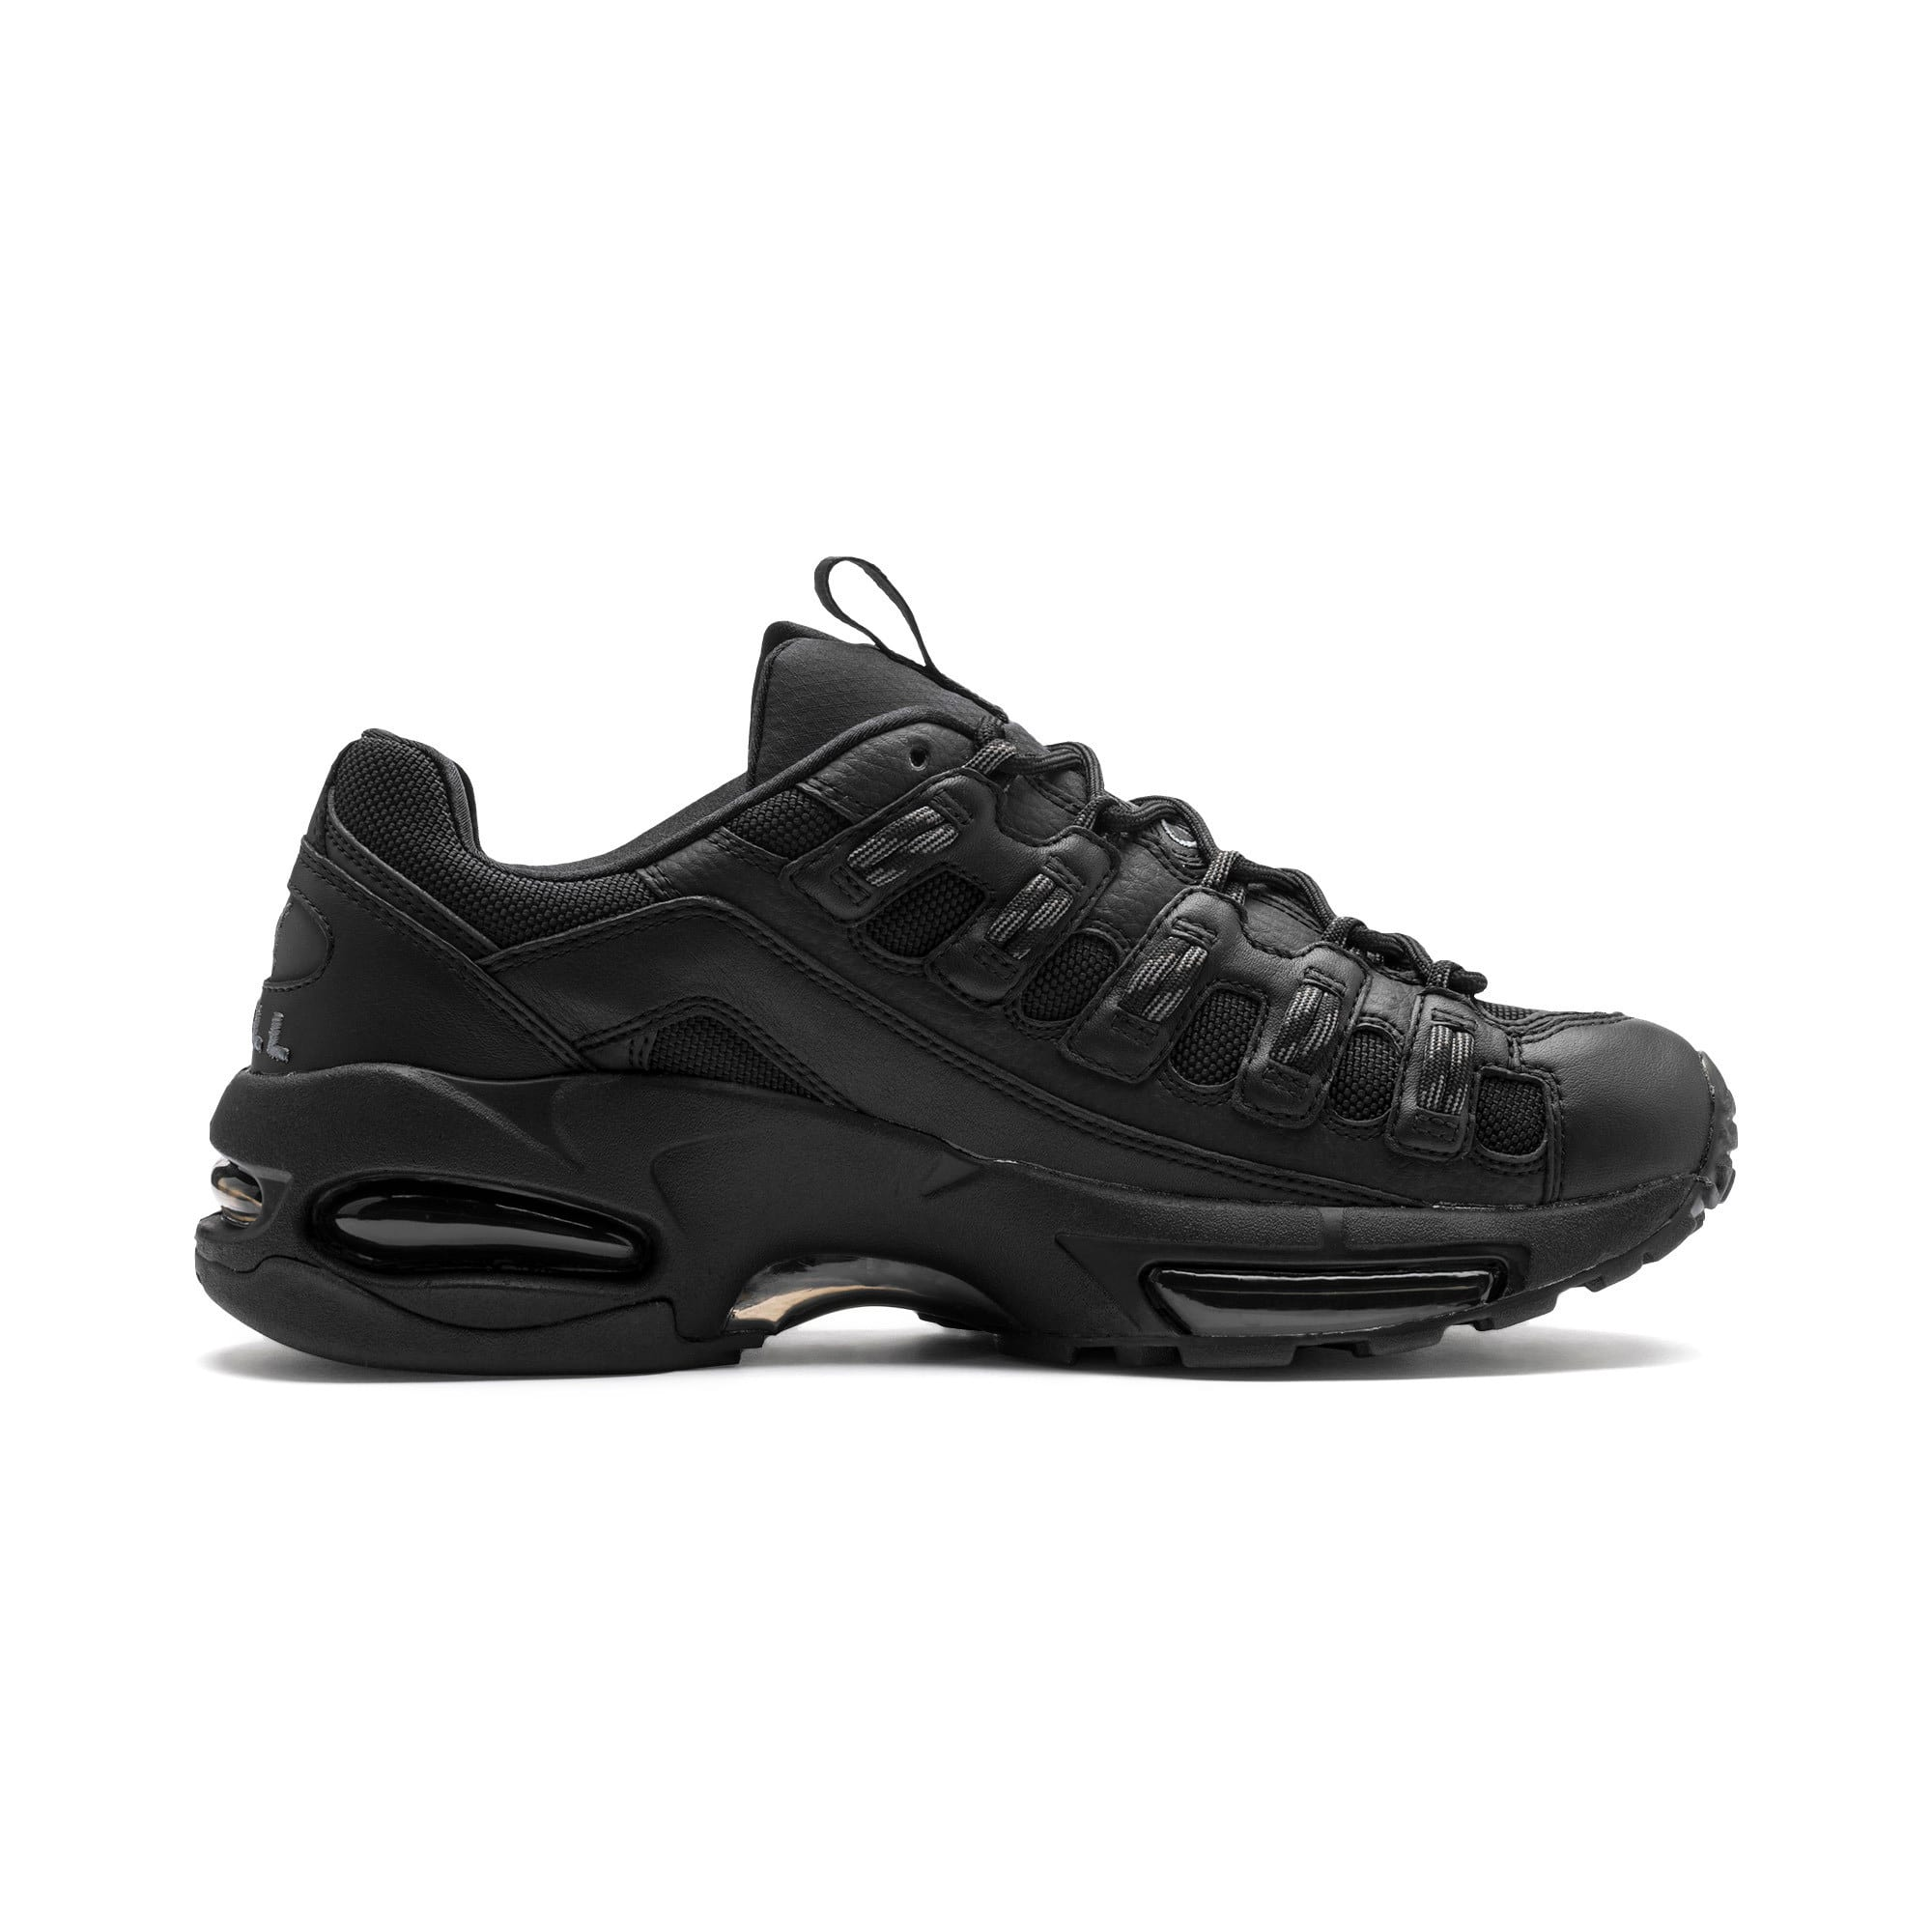 Thumbnail 6 of CELL Endura Rebound Sneakers, Puma Black-Puma Black, medium